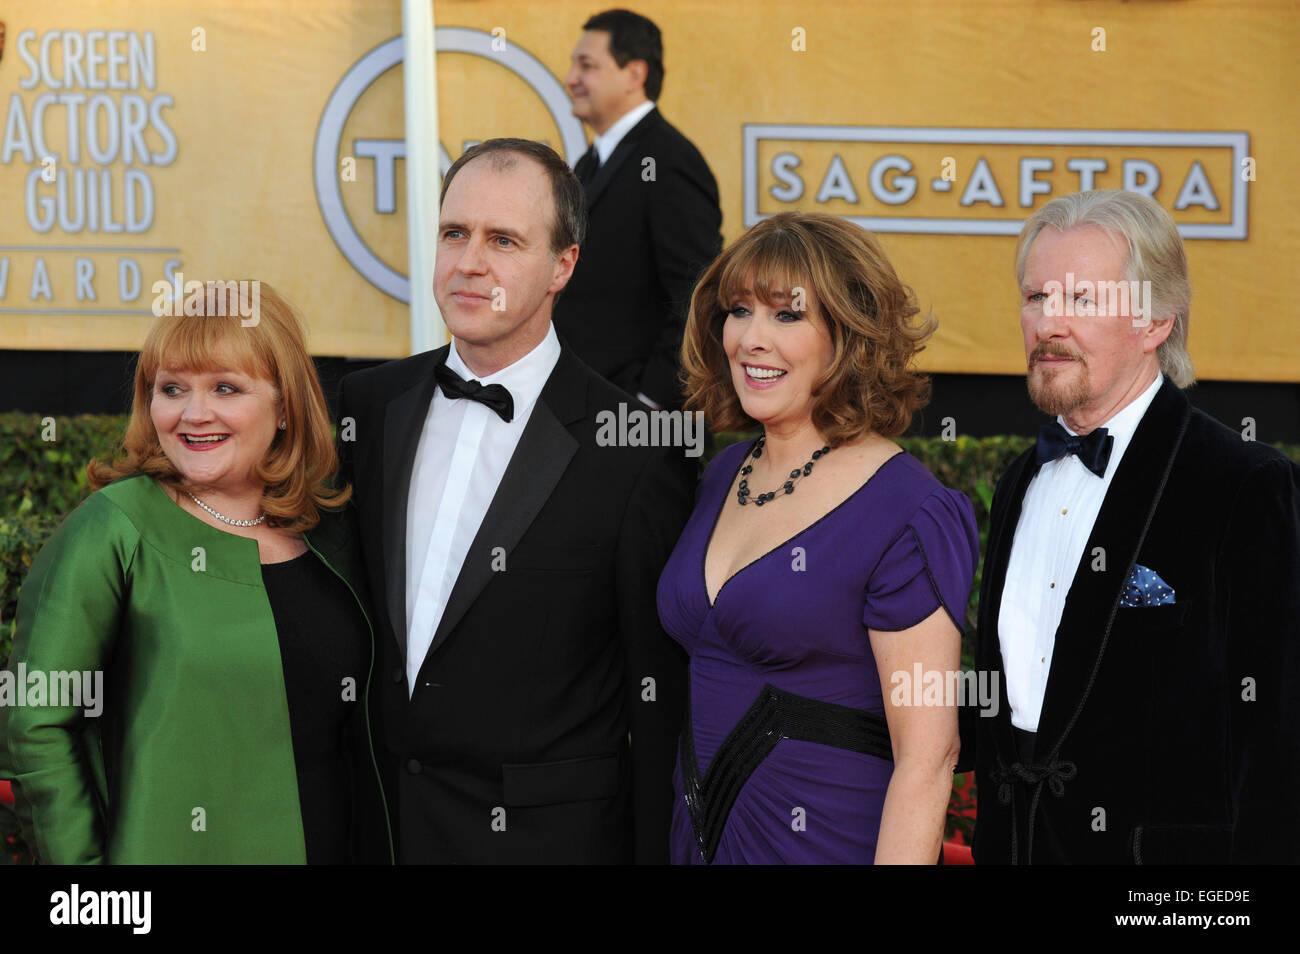 LOS ANGELES, CA - JANUARY 18, 2014: Downton Abbey stars Lesley Nicol, Kevin Doyle, Phyllis Logan & David Robb - Stock Image